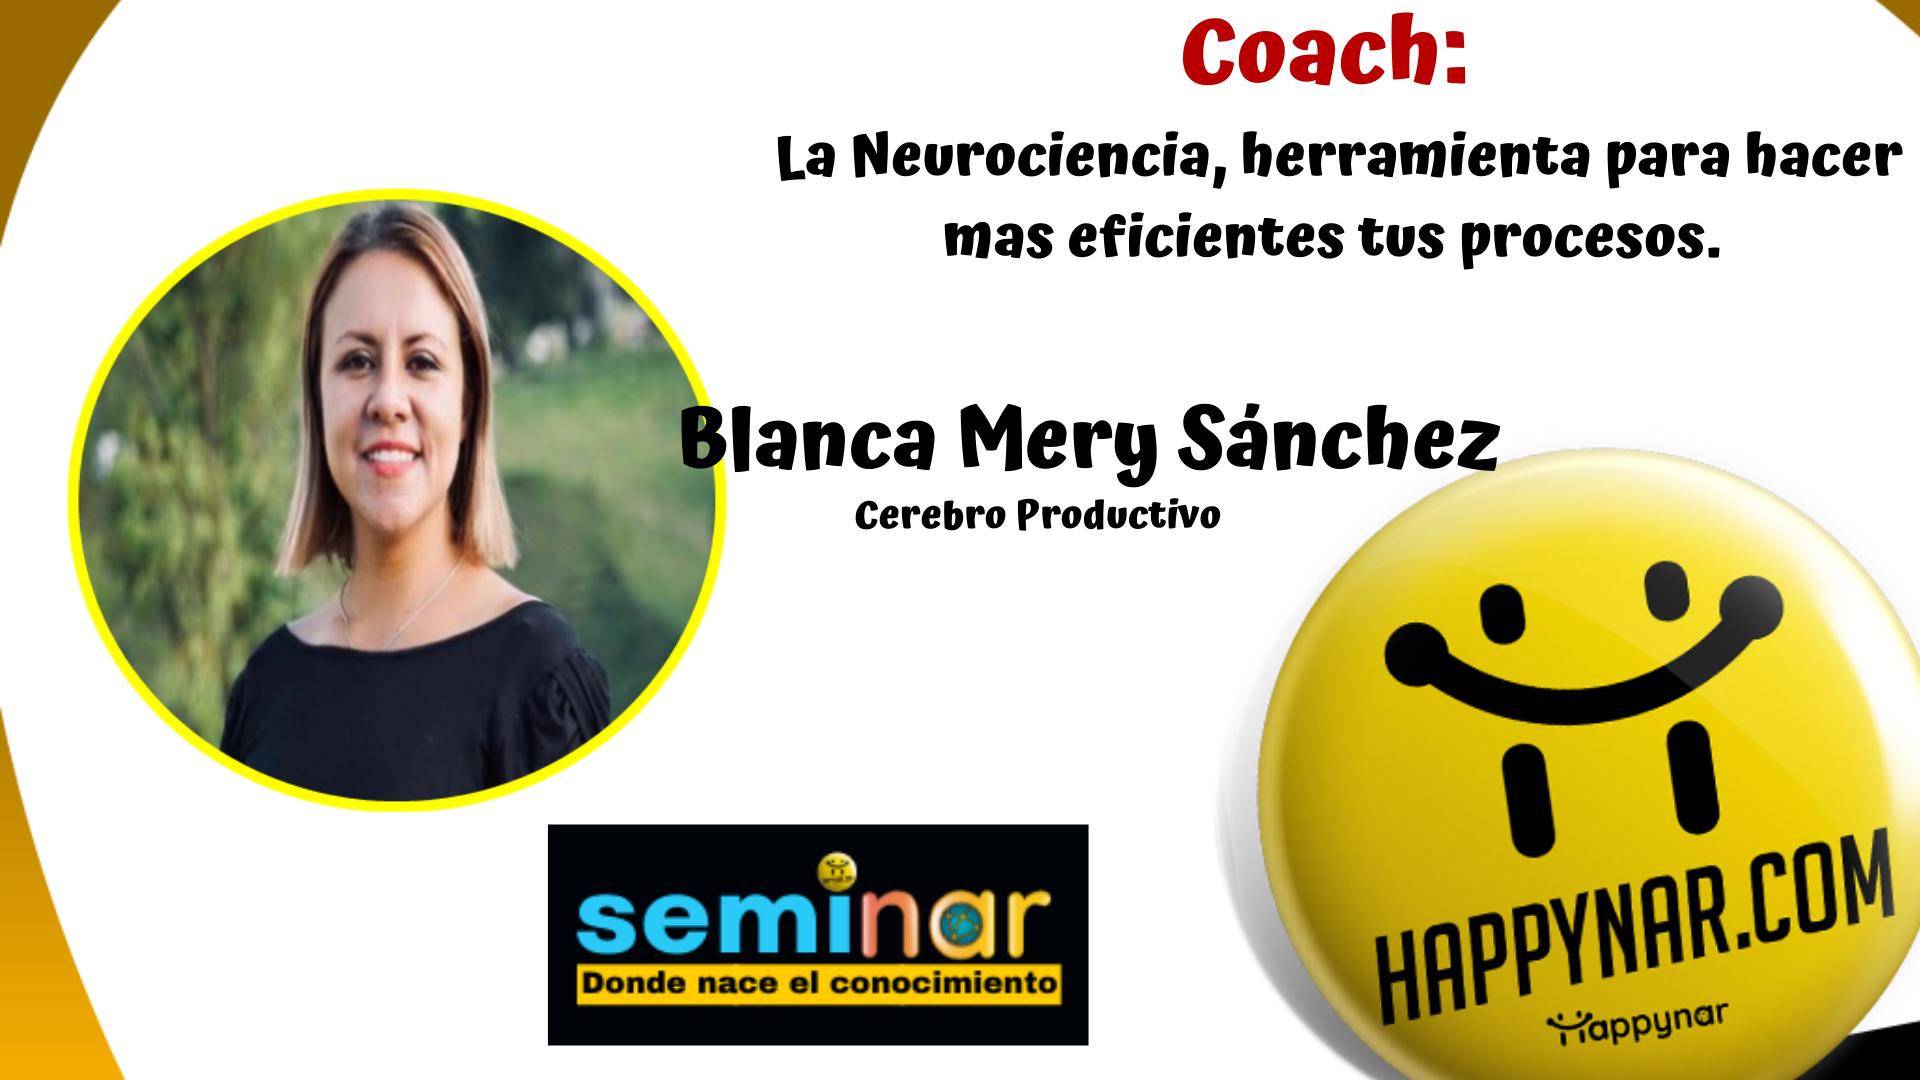 Blanca Mery Sánchez - Col